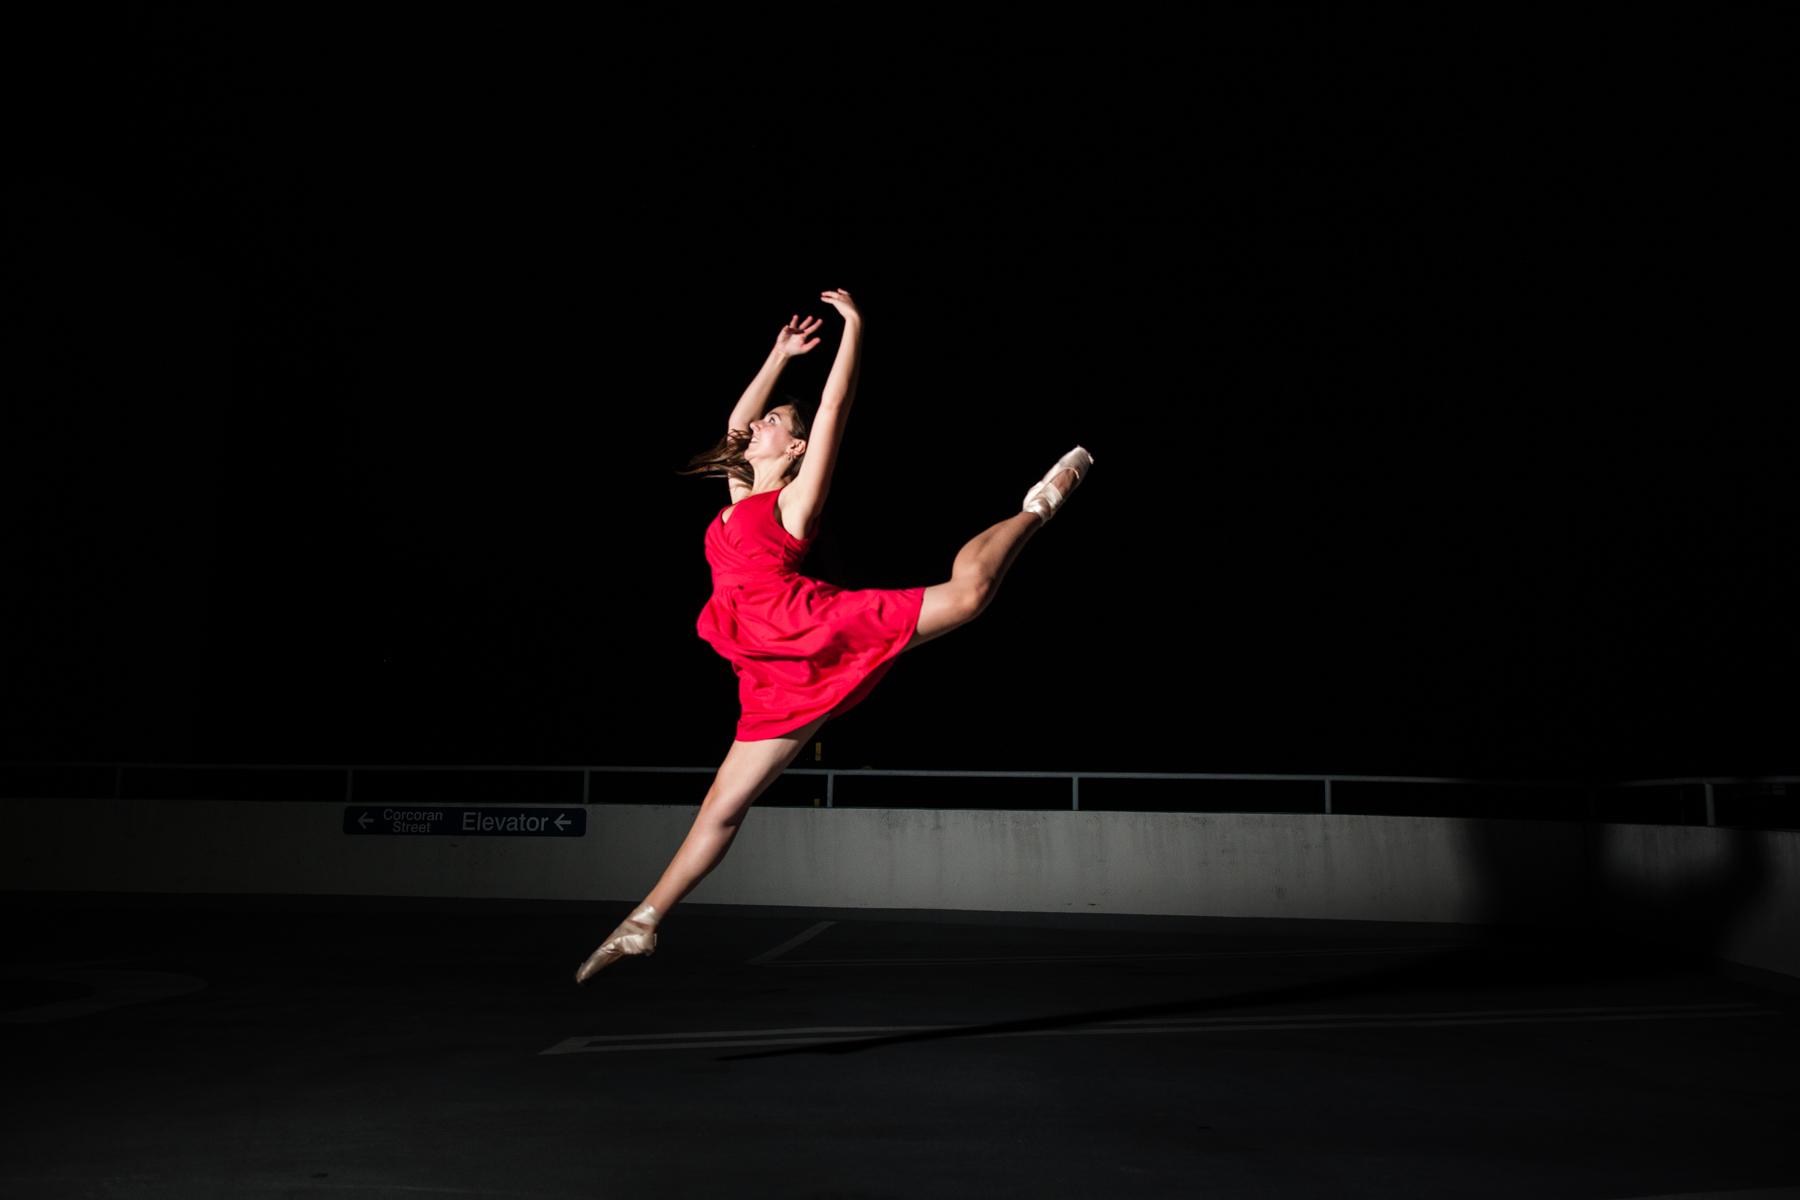 2016_07_28_anne_talkington_durham_dances_ballet_corcoran-180.jpg